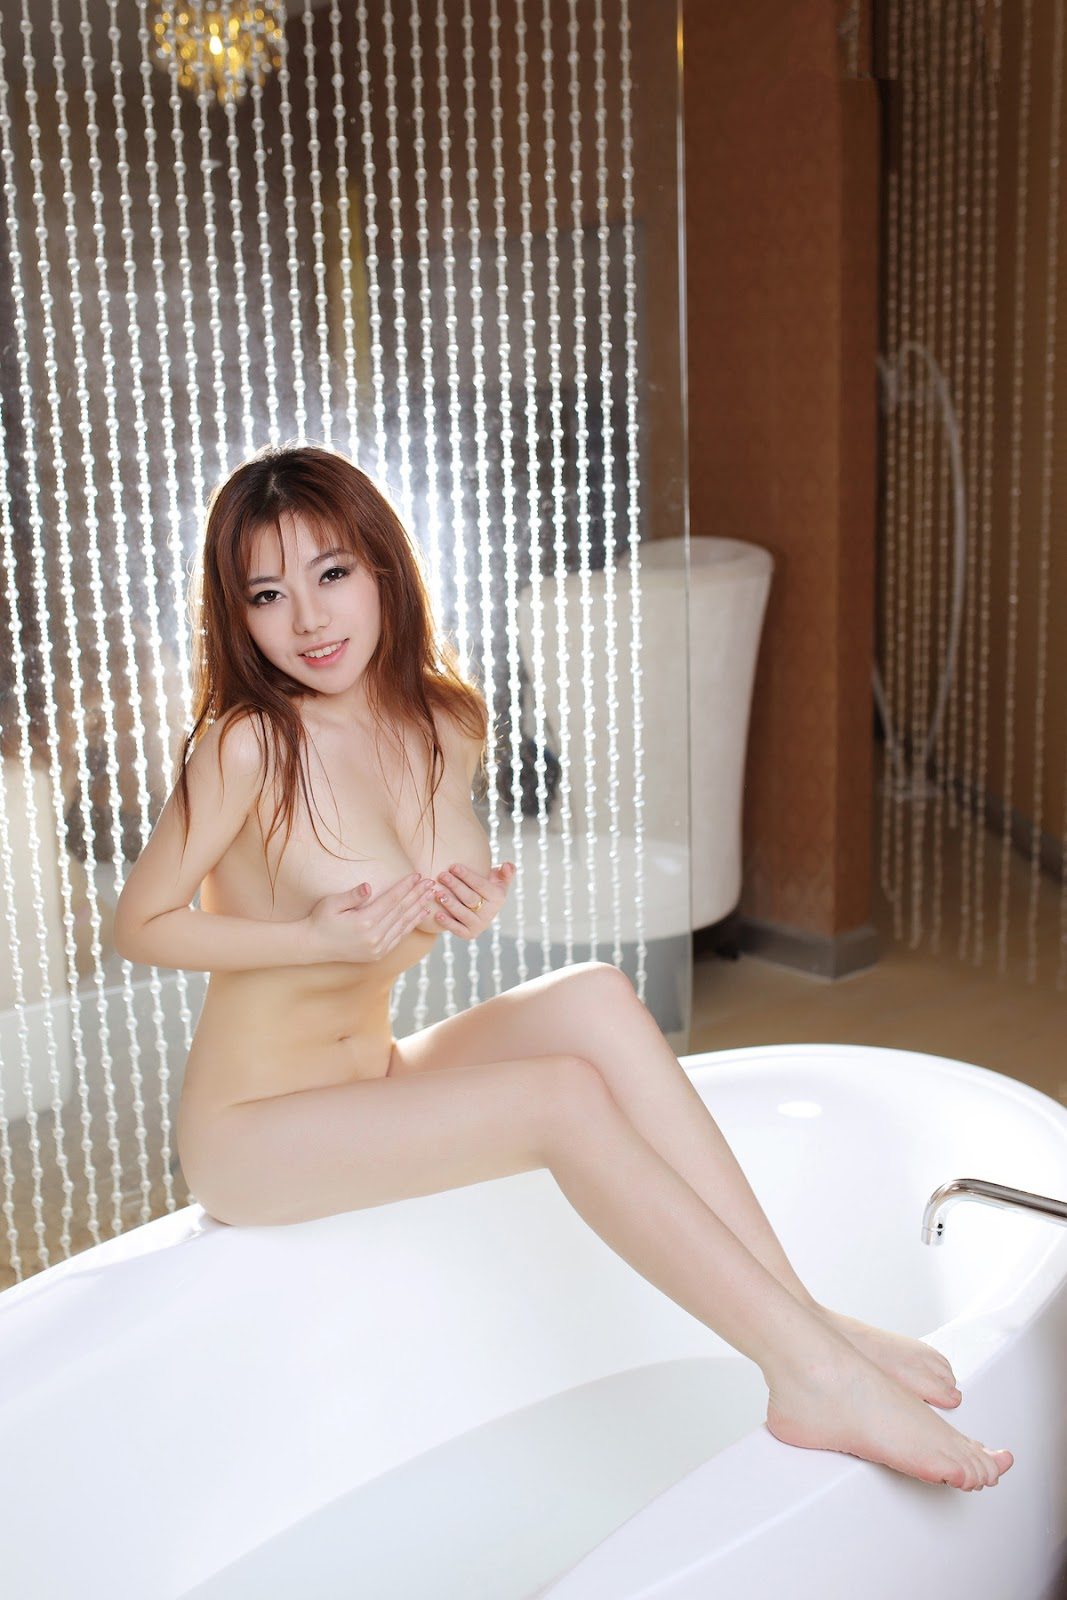 %2529%252B%252B%25C2%25A6%25C2%25B7 16 - TGOD Sexy Nude FAYE